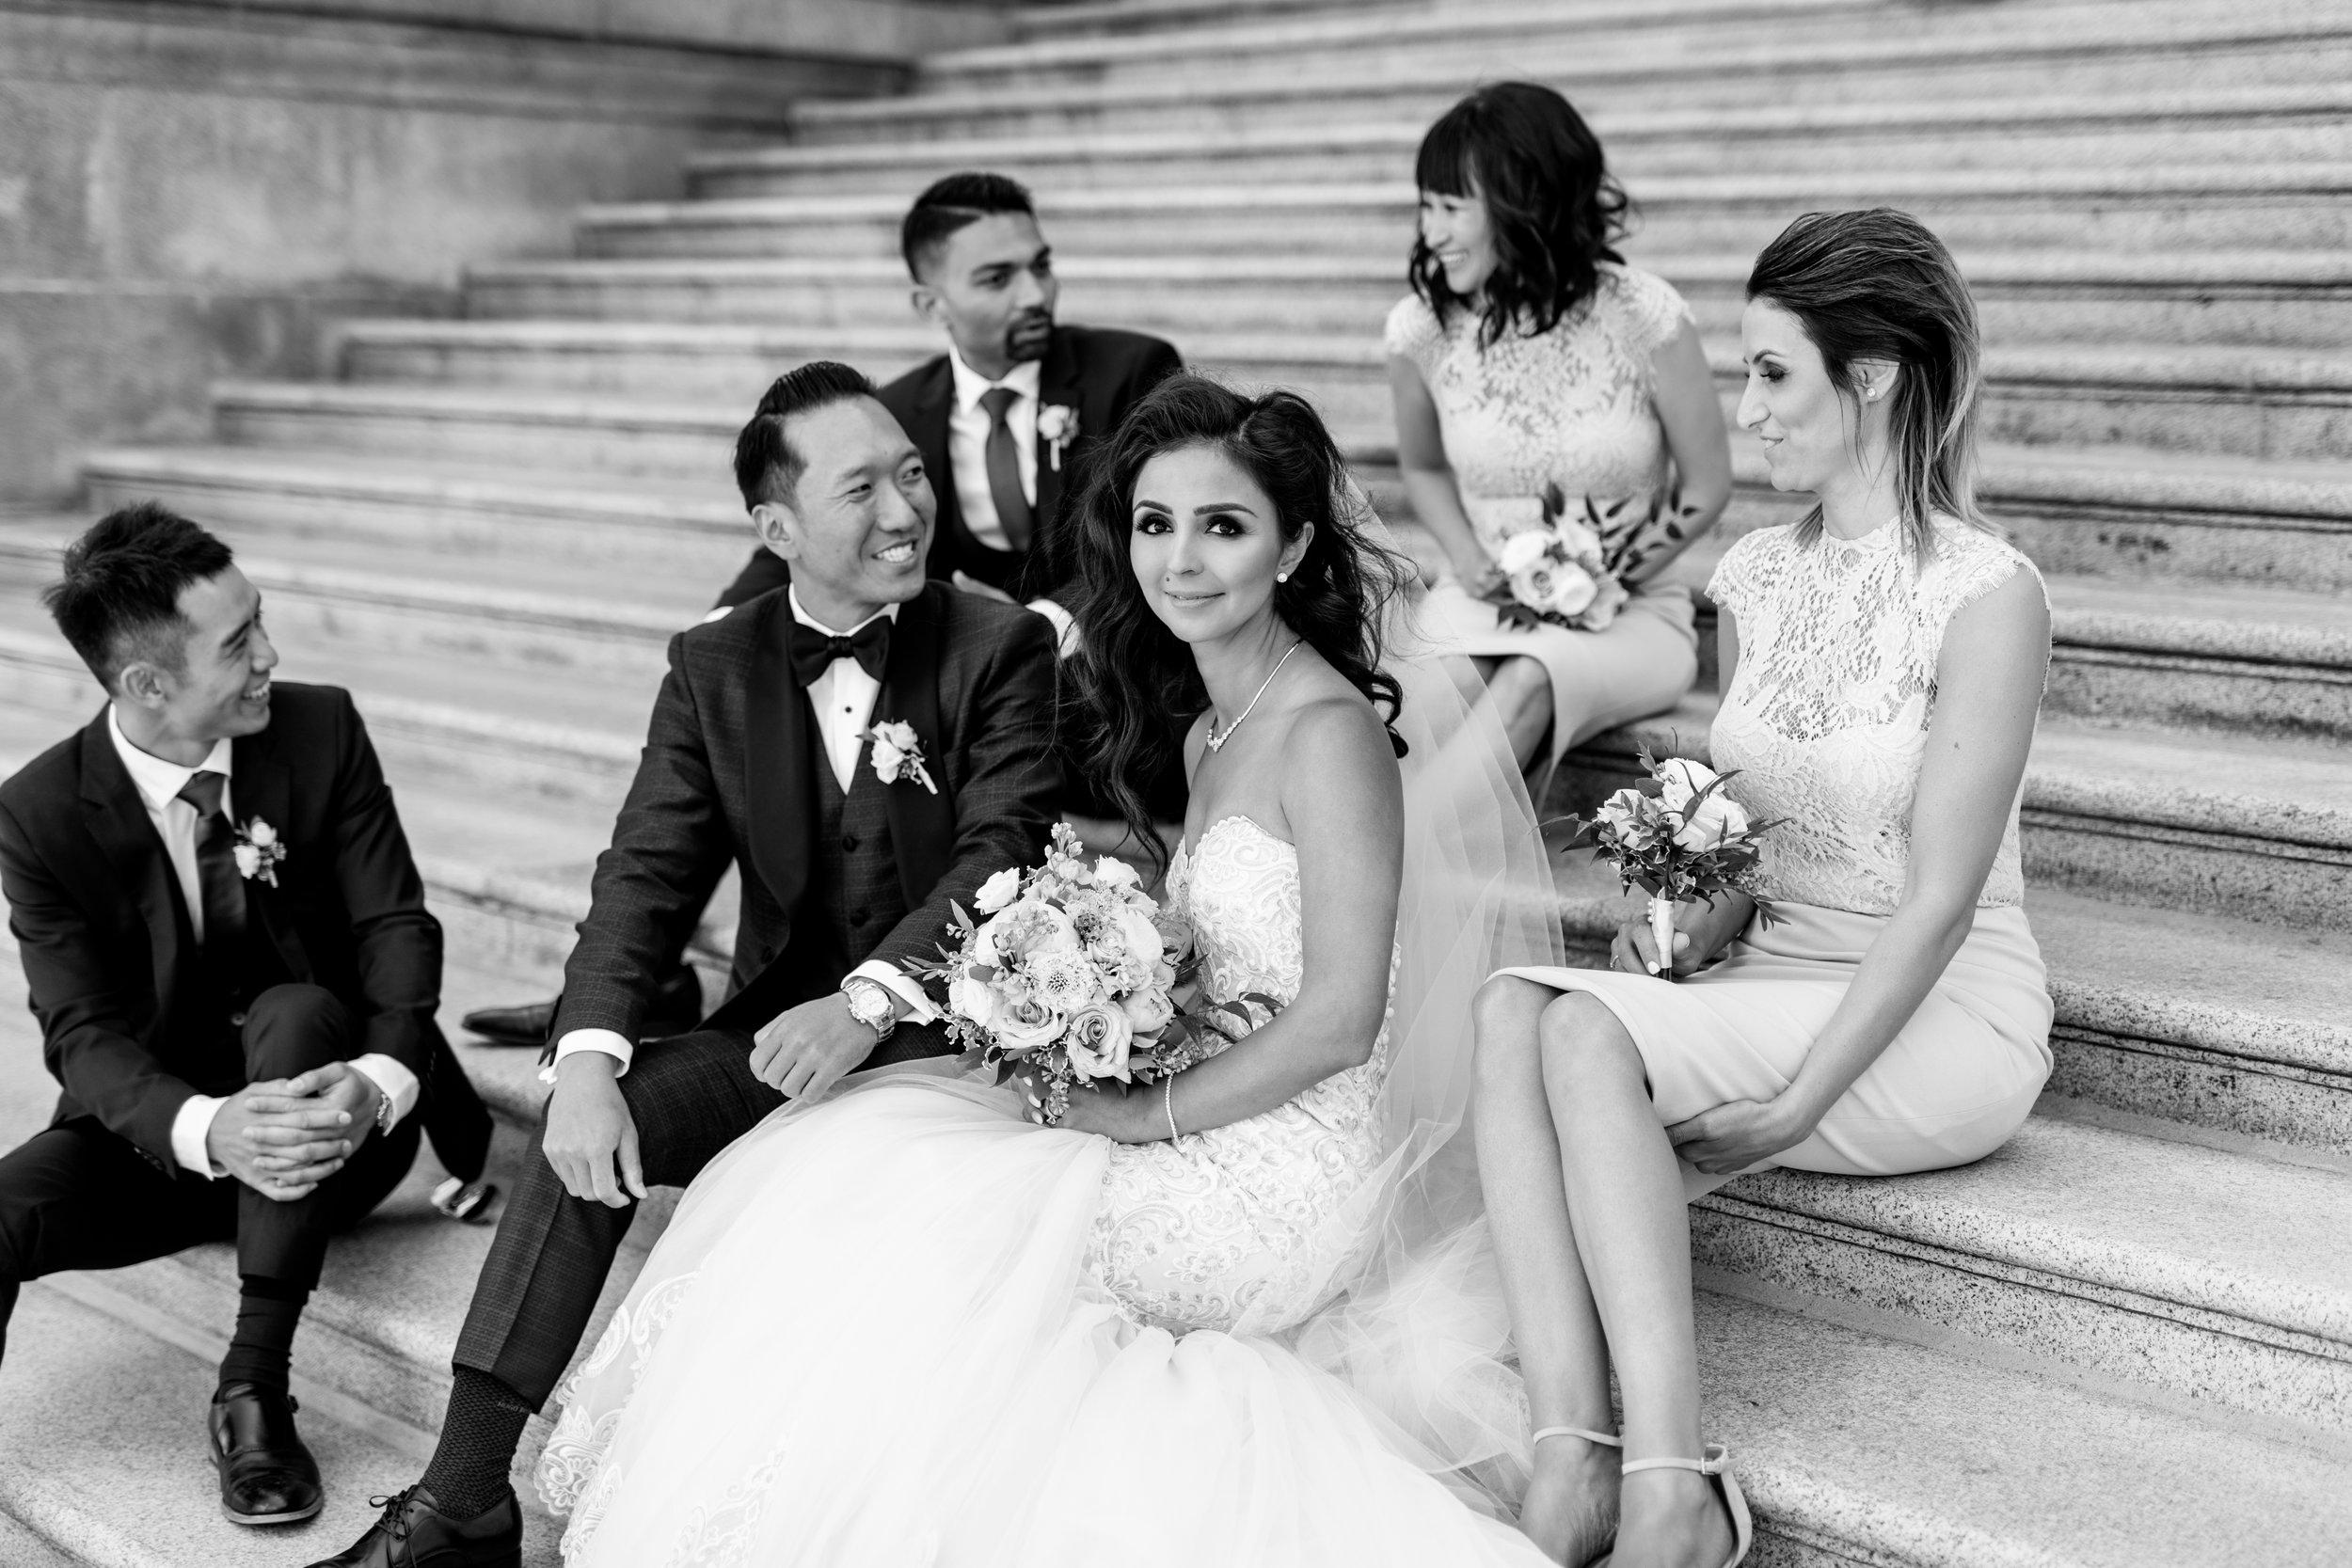 HeraStudios_FatemahVictor_Wedding_SelectsFull-32.jpg